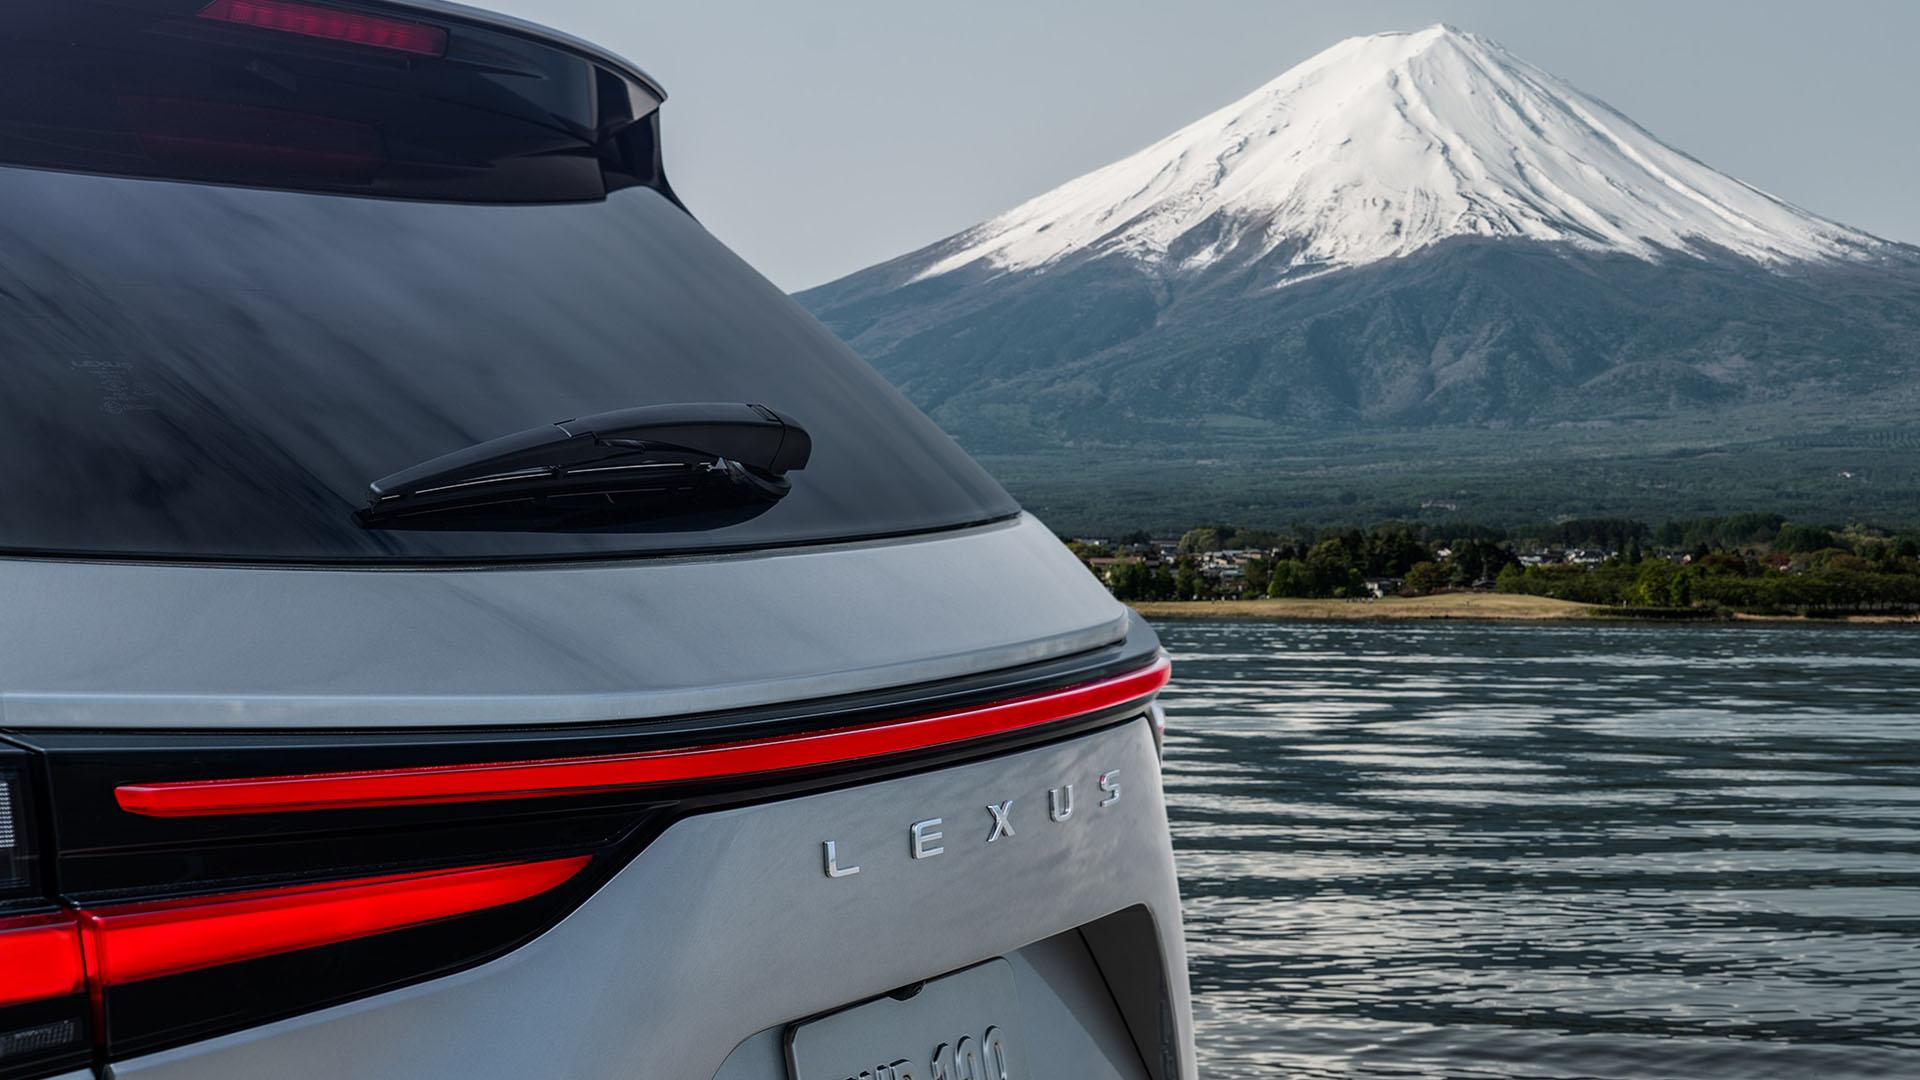 Lexus Yeni Nesil NX SUV'un Dünya Prömiyerini